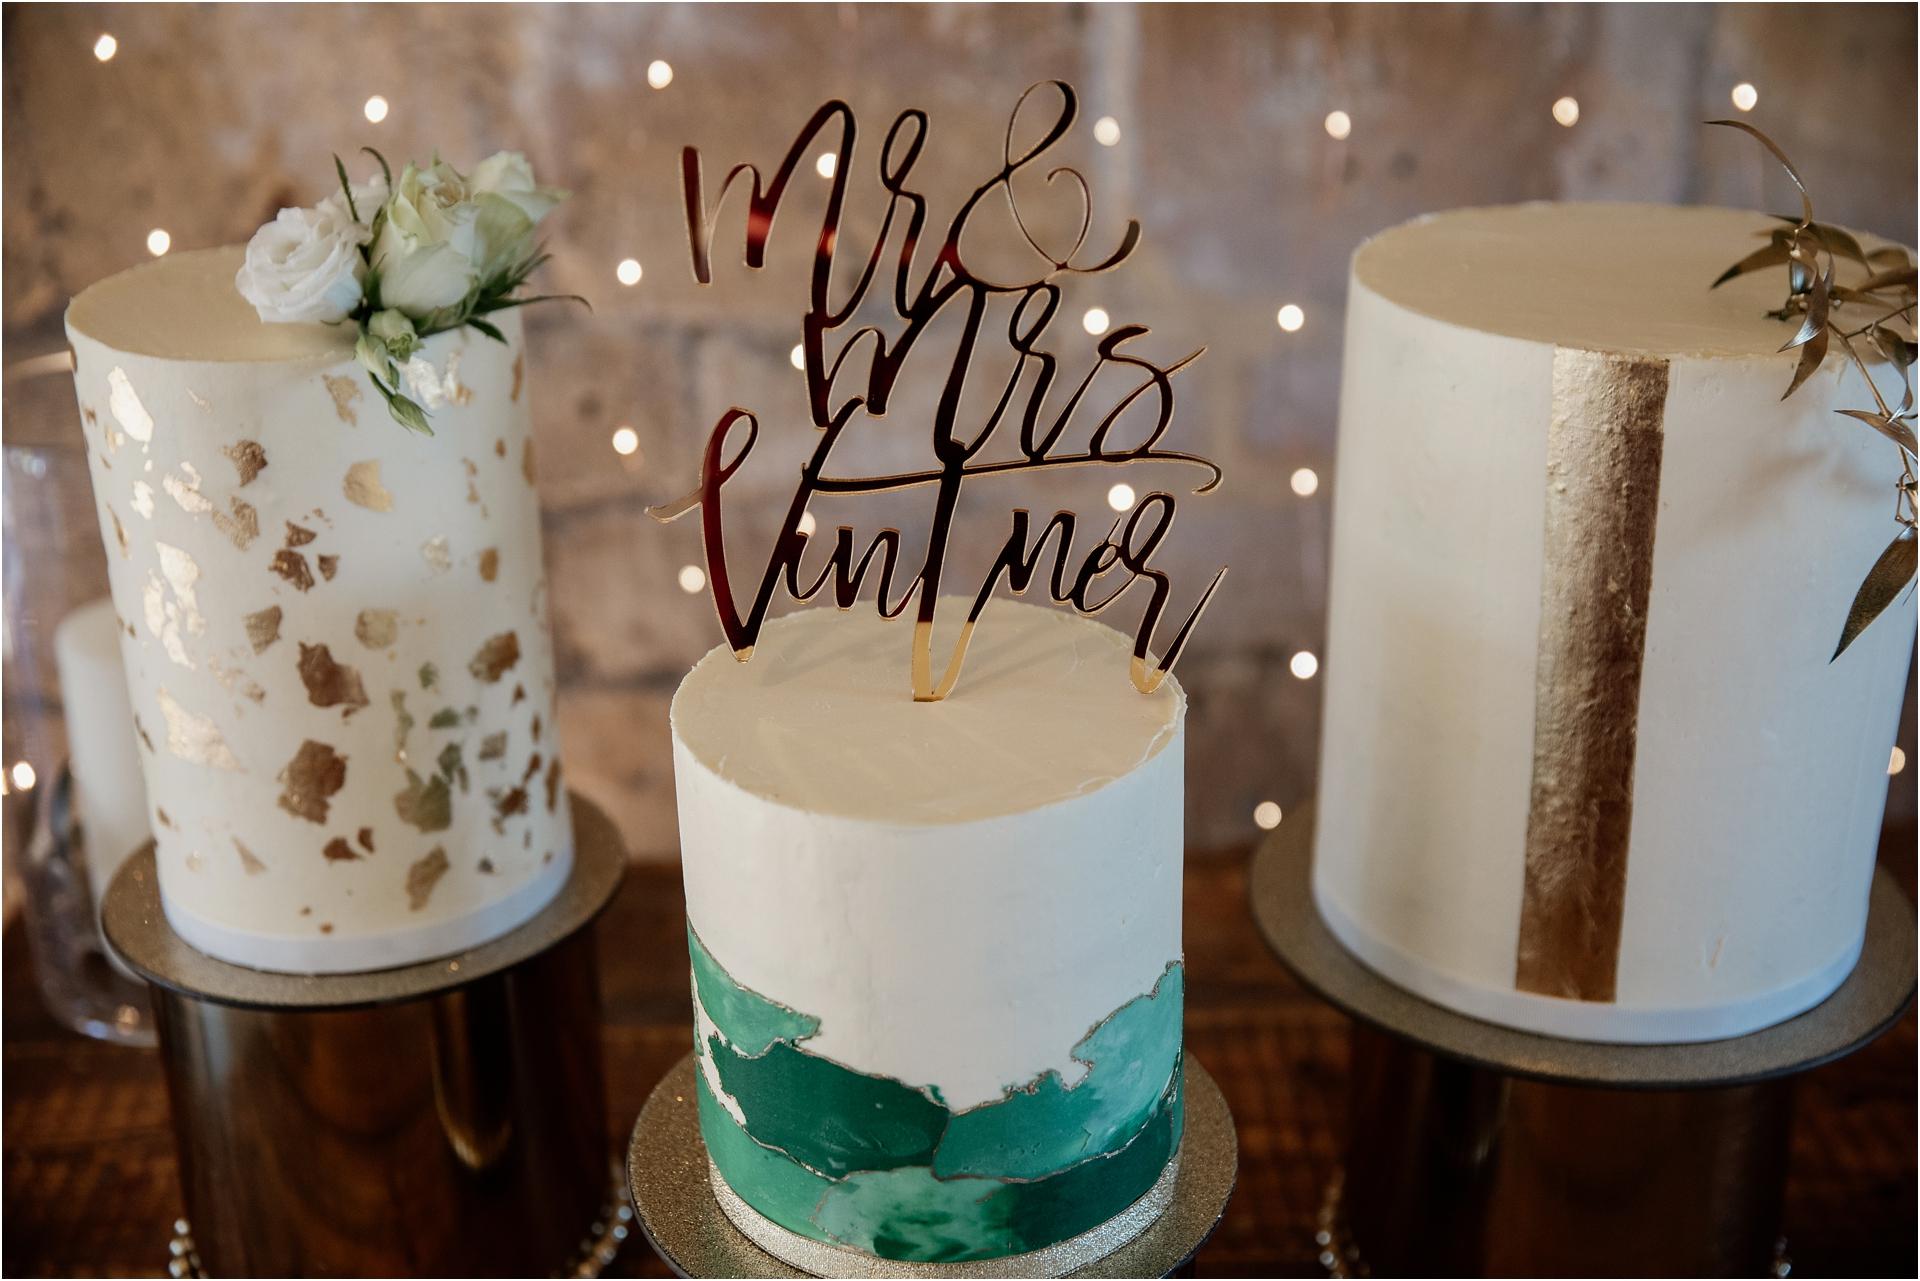 Lapstone Barn winter wedding cakes